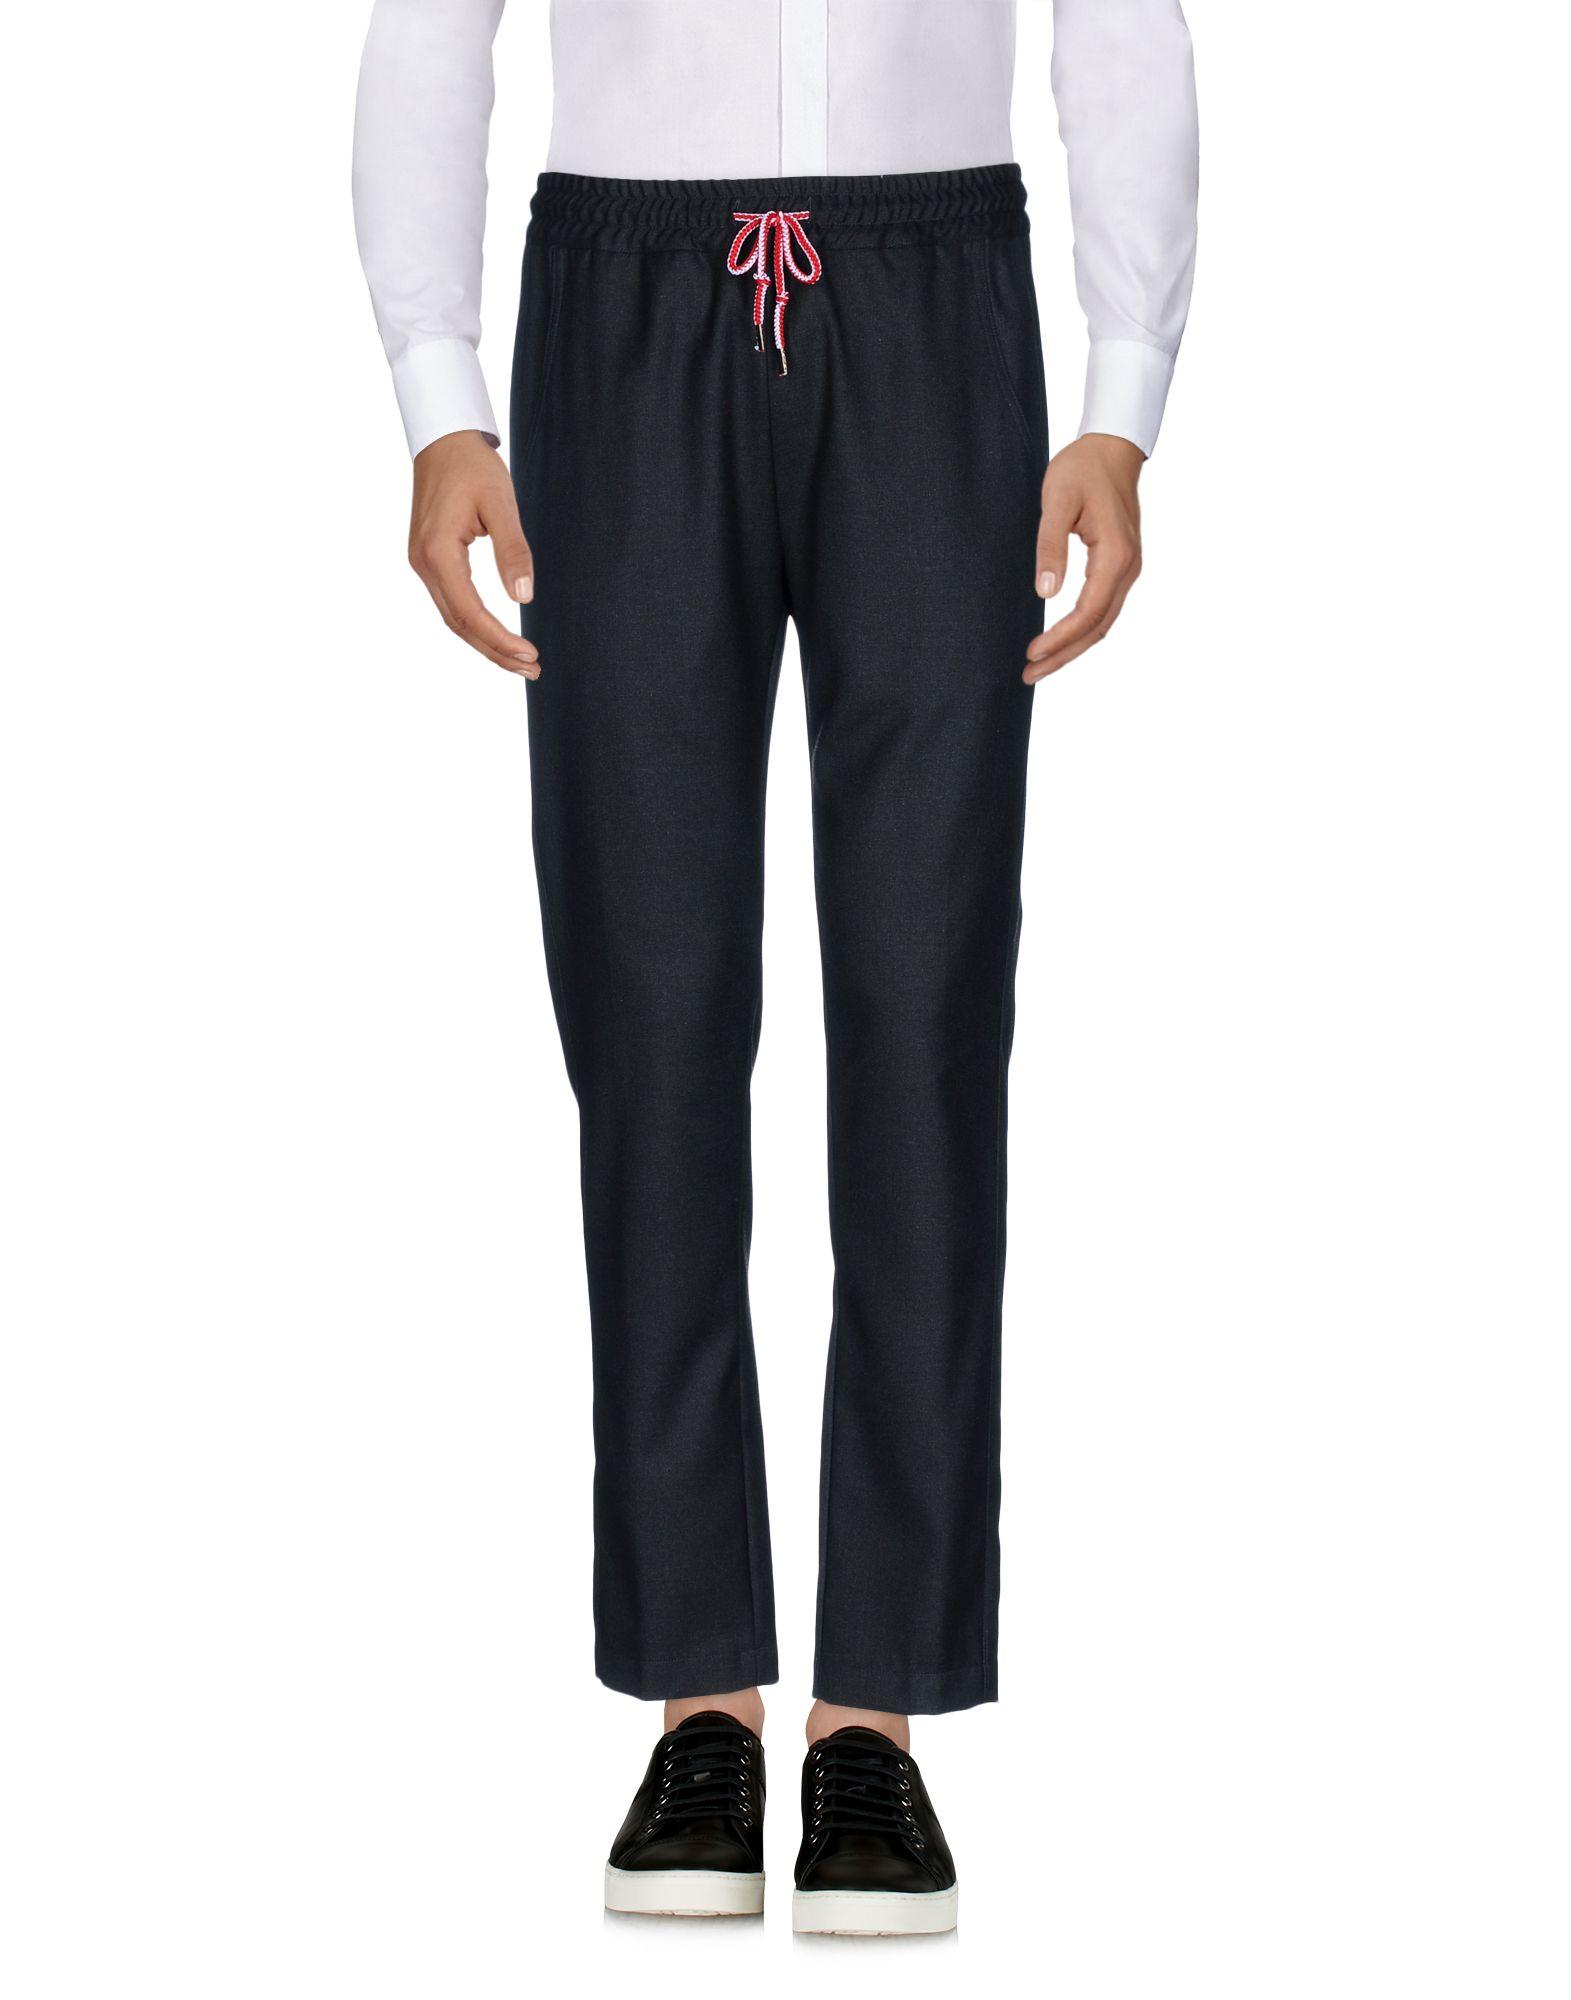 DANIELE ALESSANDRINI HOMME Повседневные брюки daniele michetti daniele michetti ботильоны женские 134